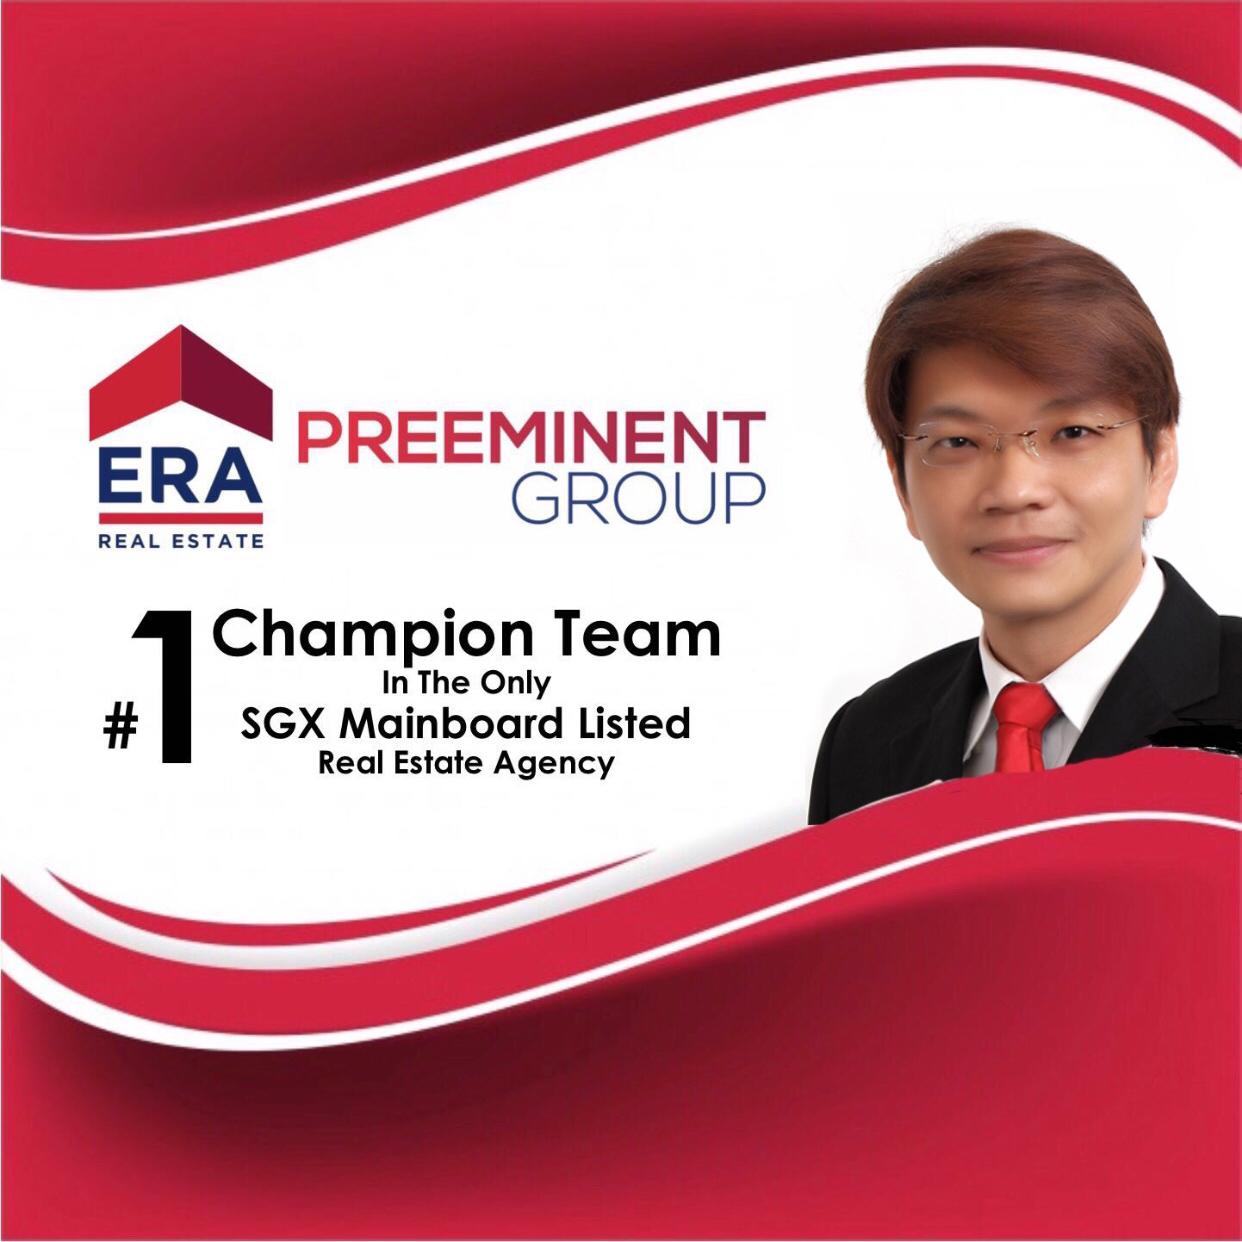 Chris Yaw R004851A 83836751